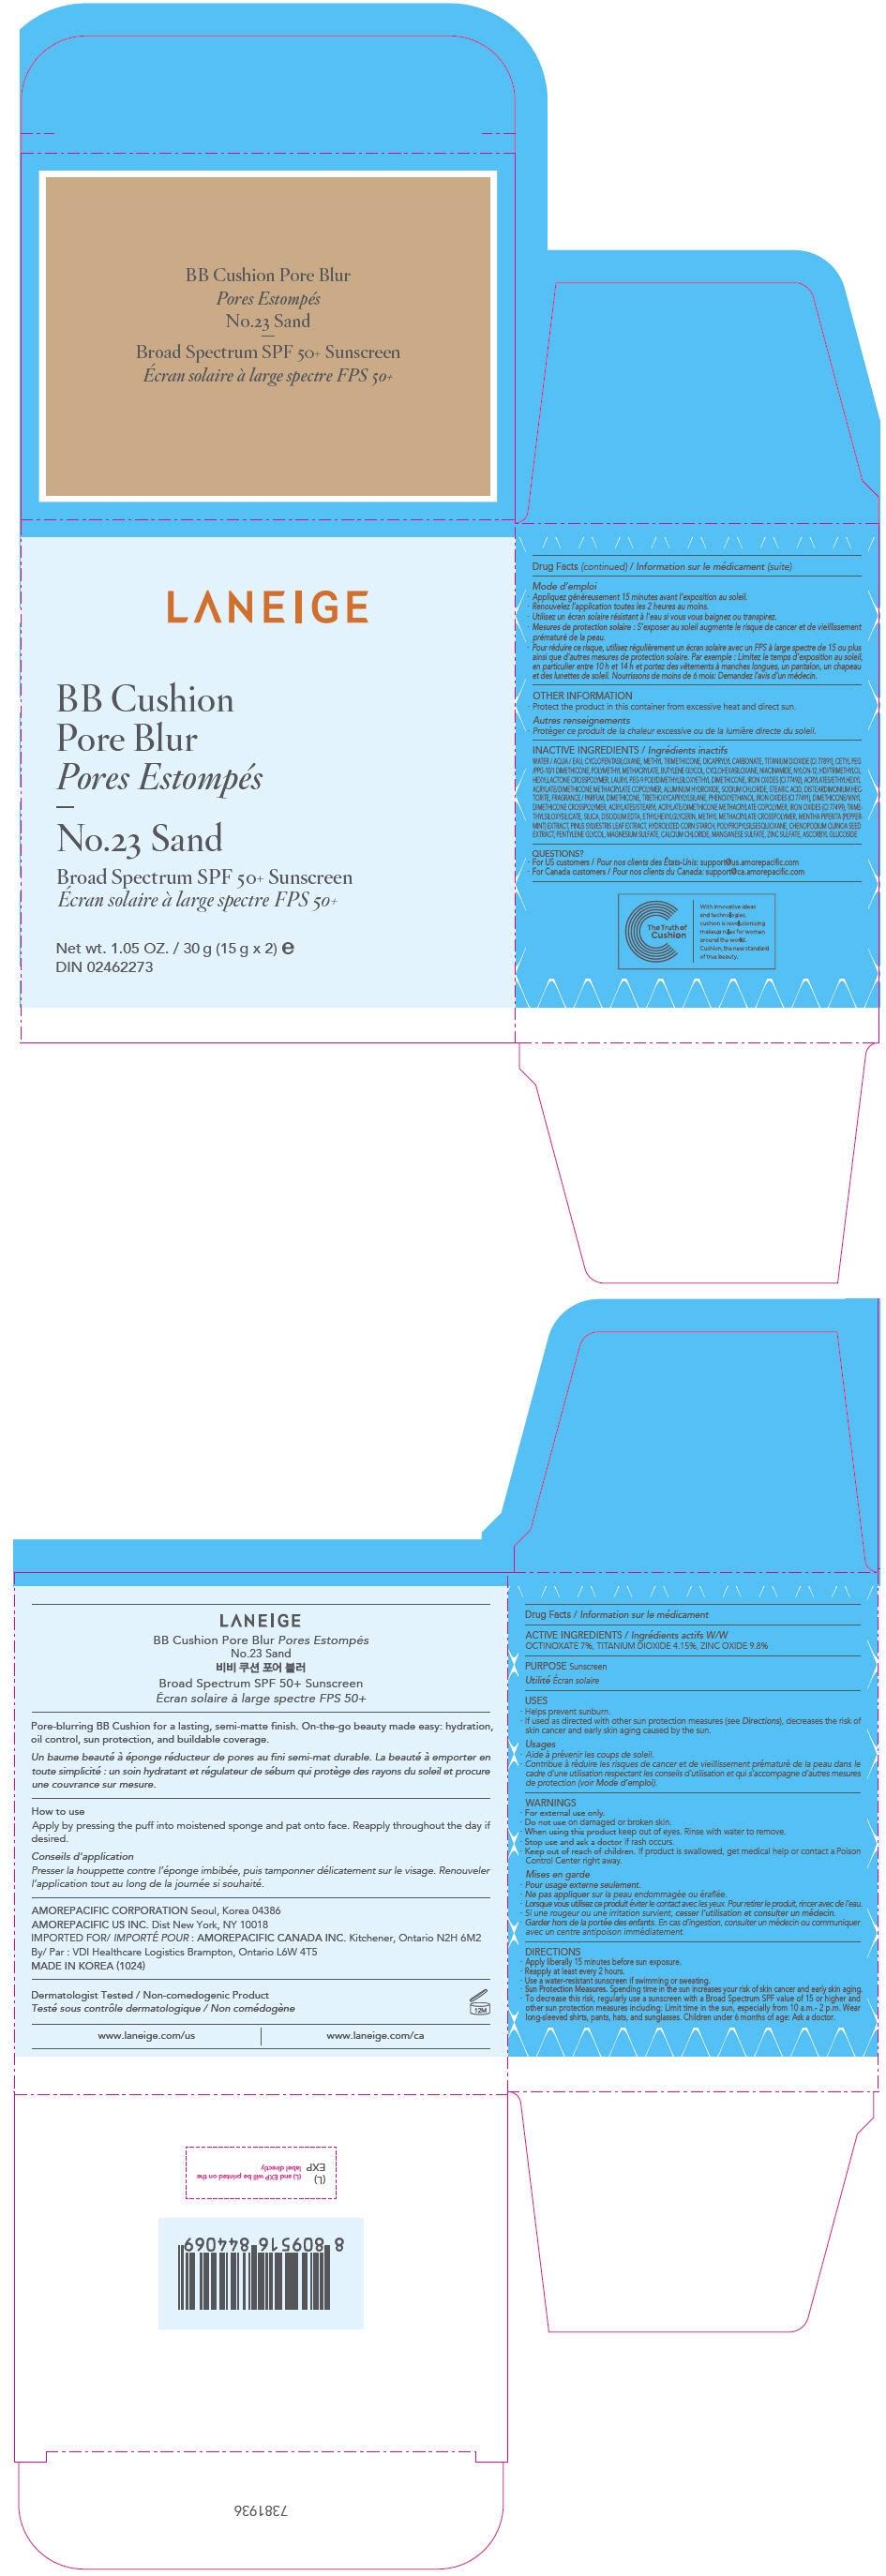 PRINCIPAL DISPLAY PANEL - 30 g Container Carton - No.23 Sand